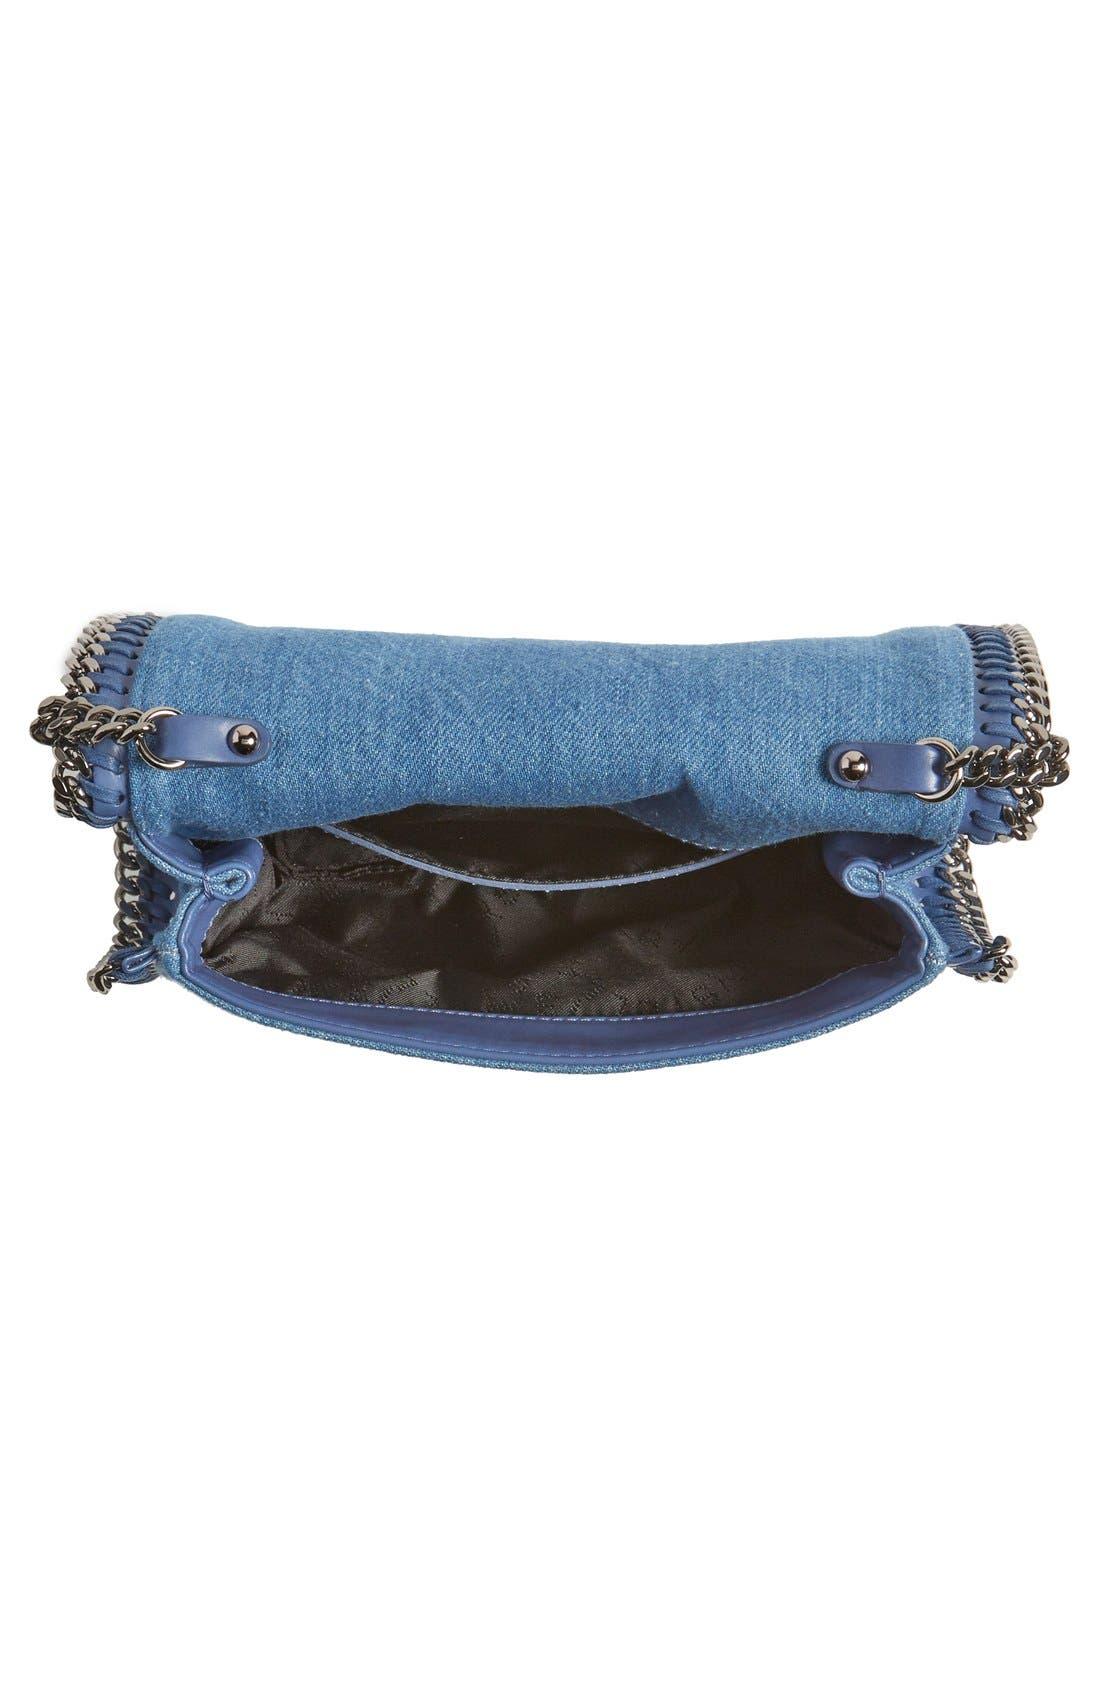 Alternate Image 4  - Stella McCartney 'Falabella - Adorned' Denim Crossbody Bag